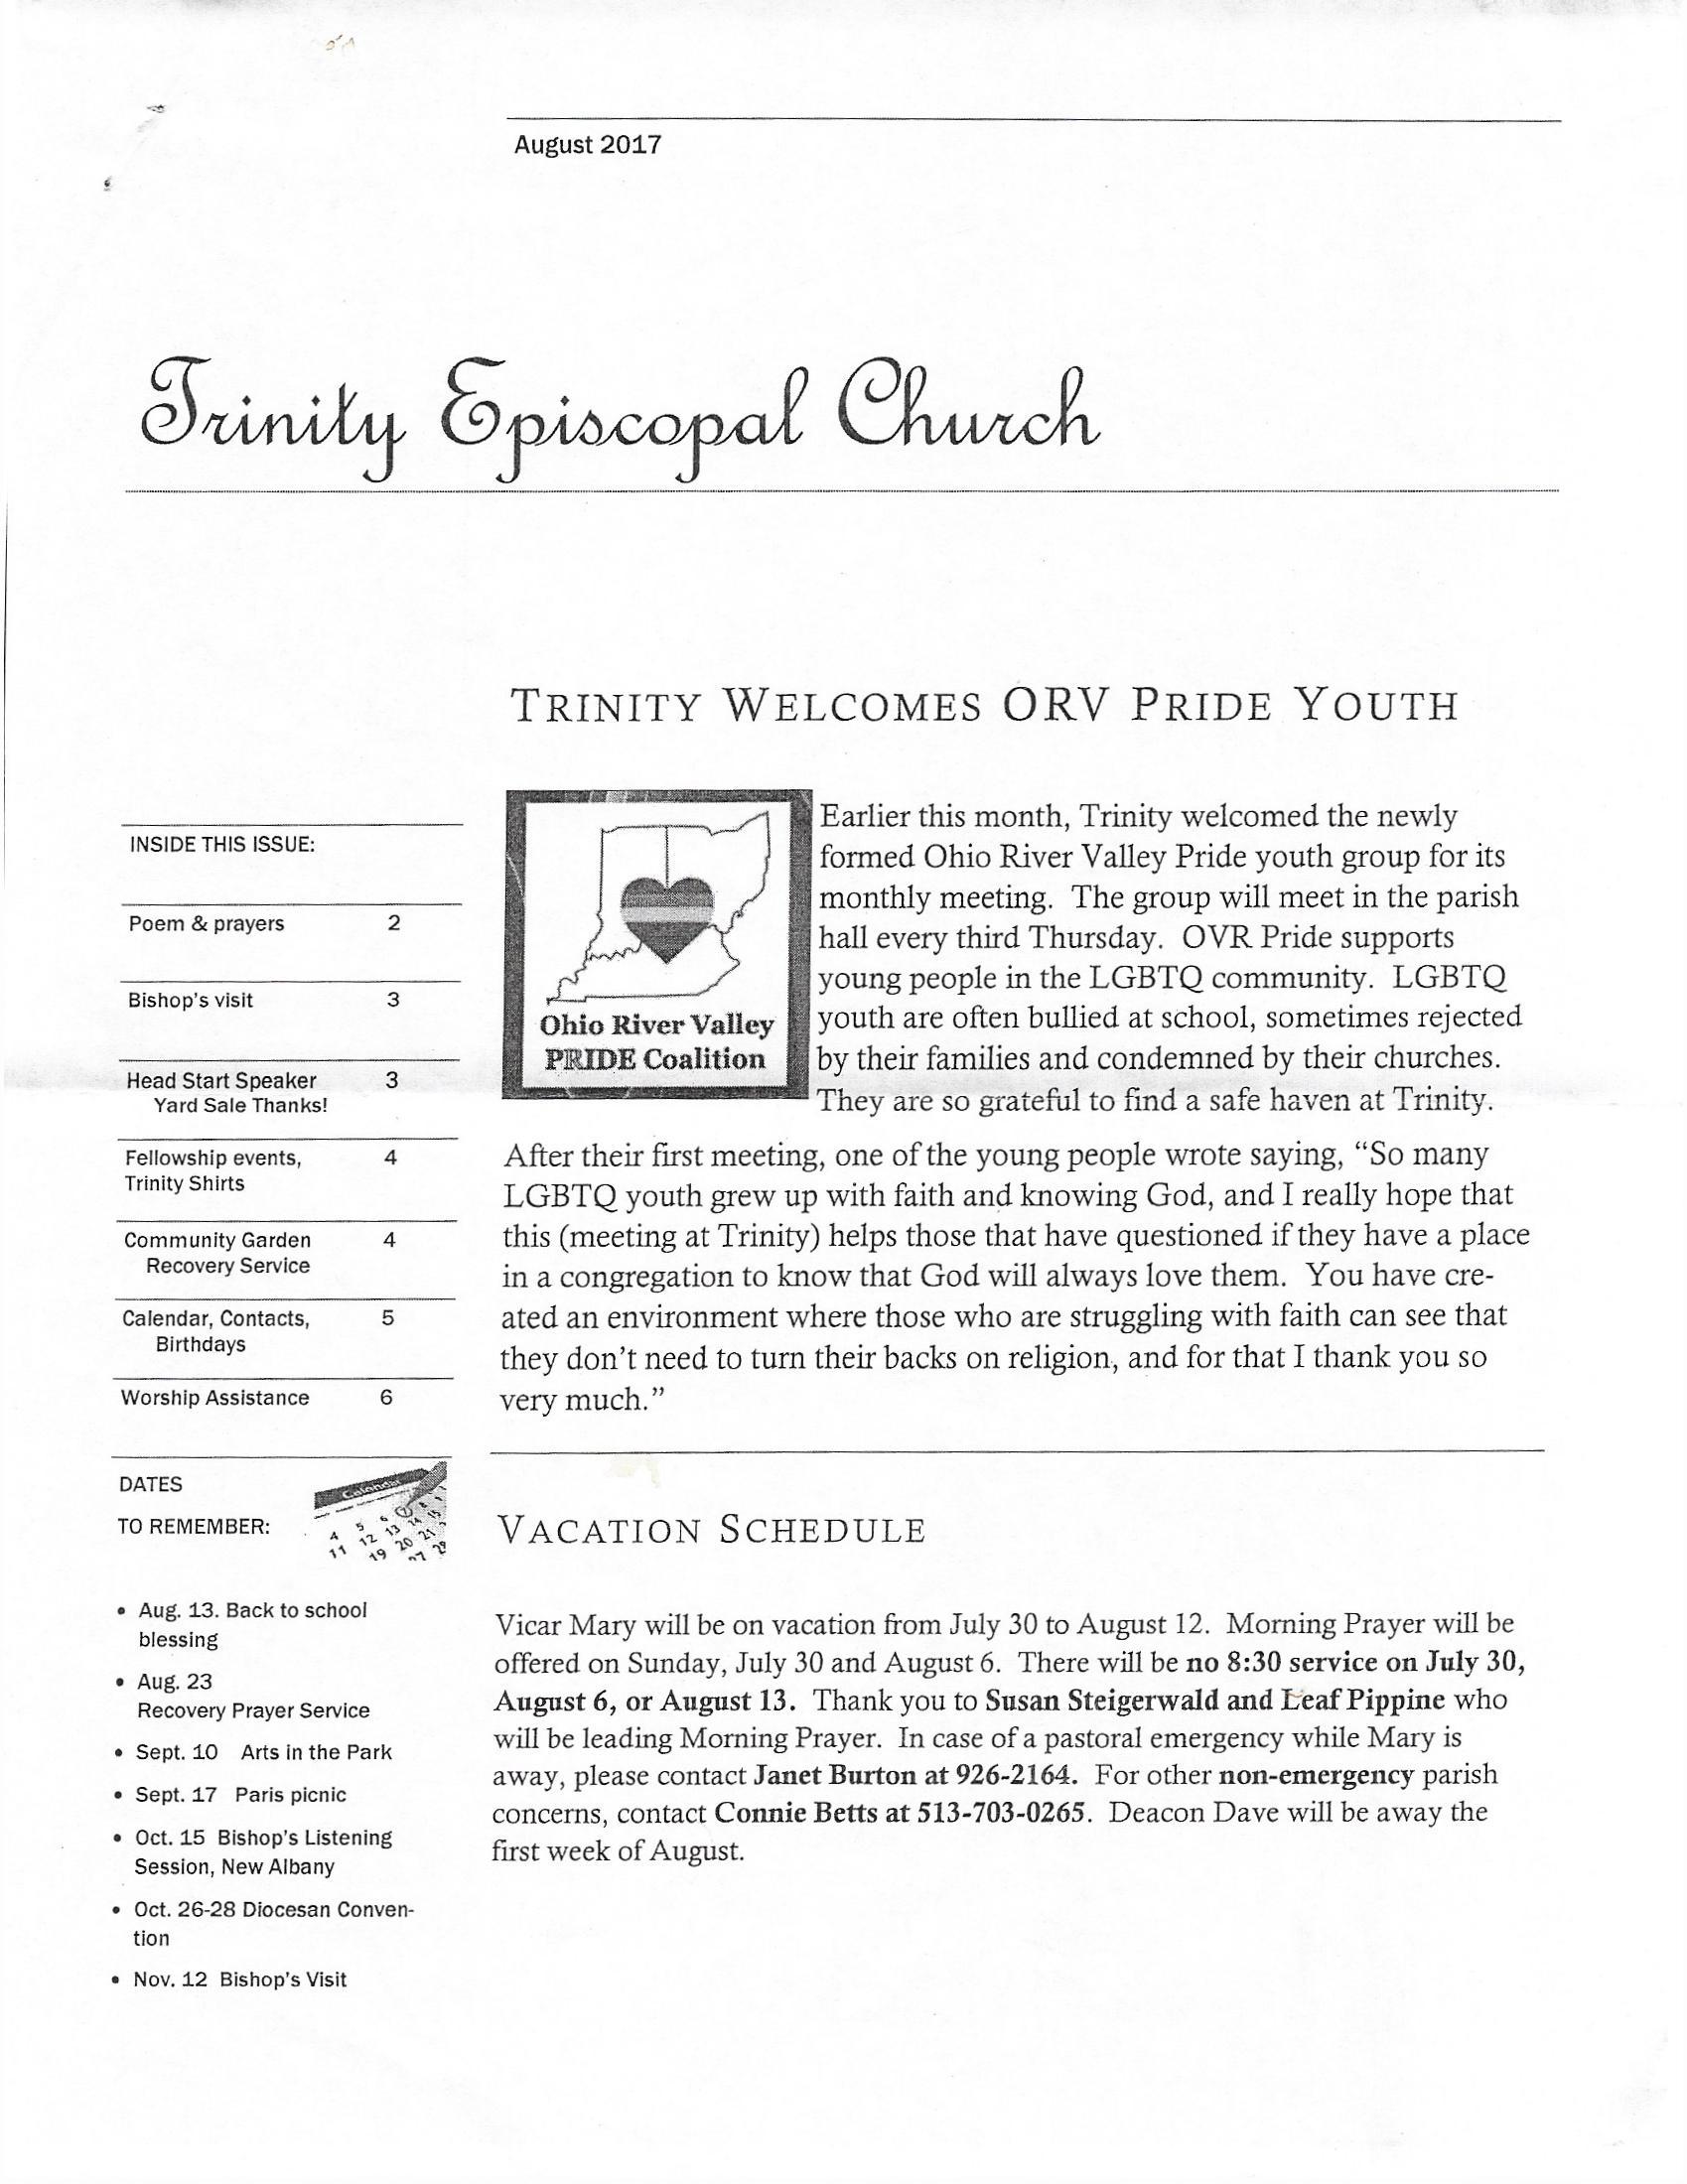 Source: Trinity Episcopal Church's Newsletter, August 2017